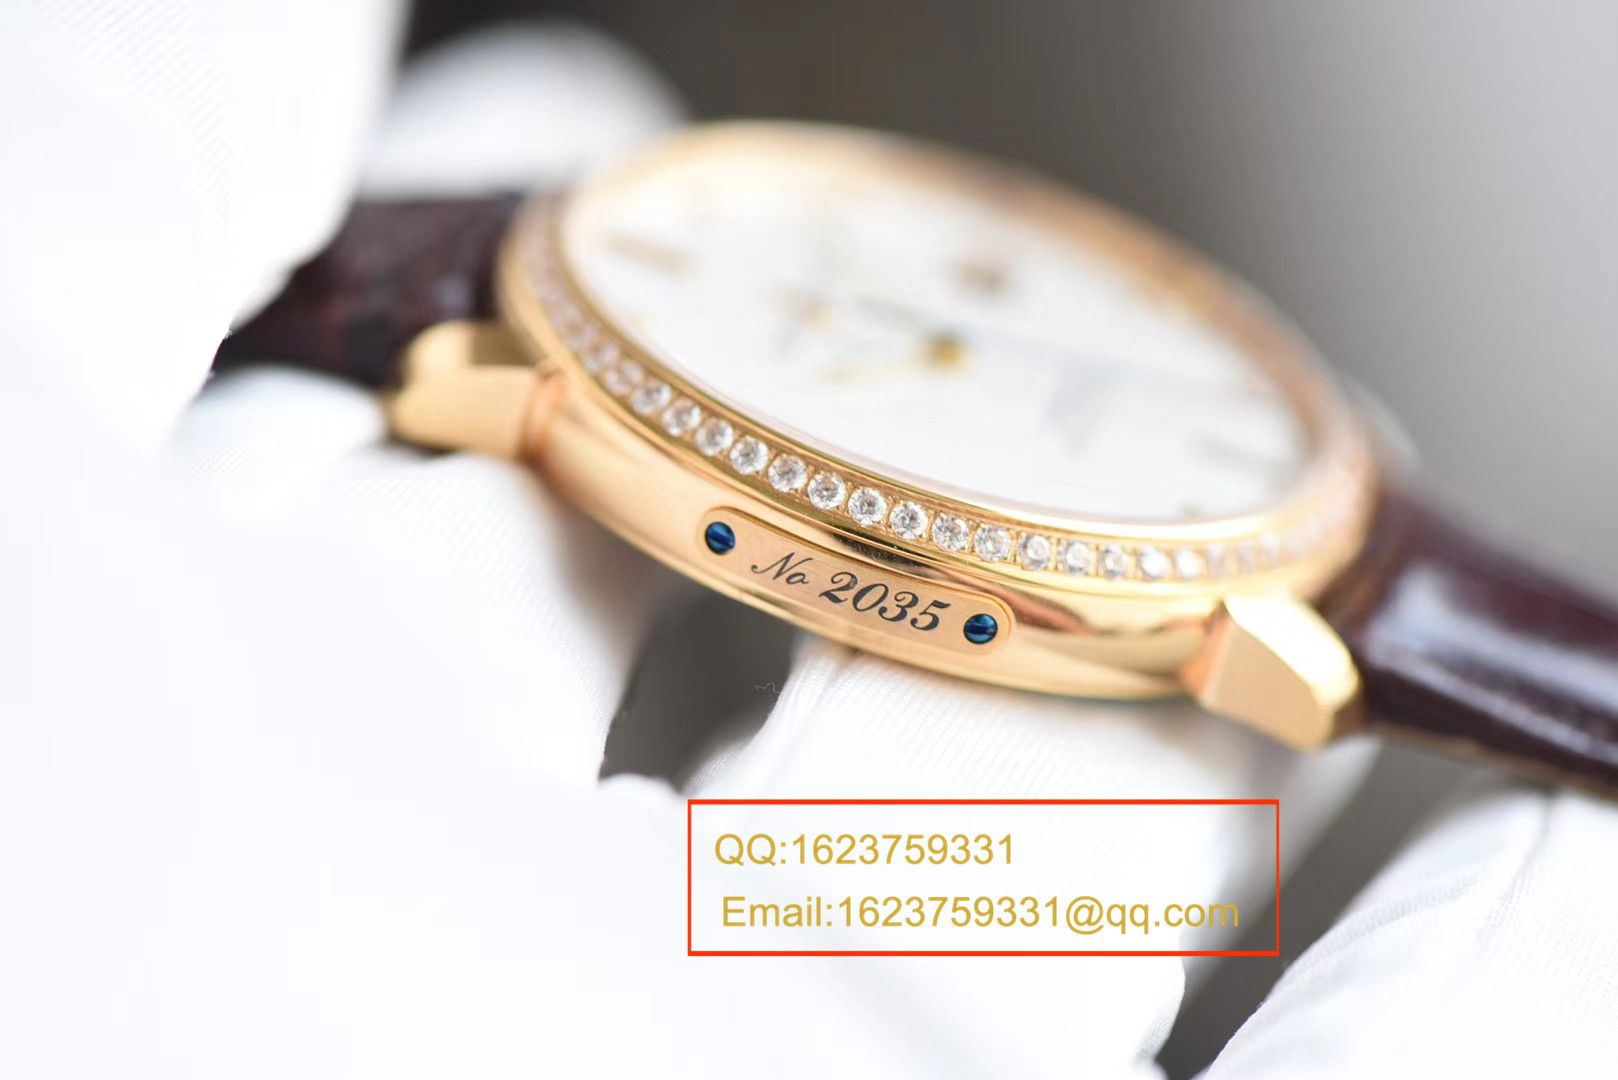 【FK一比一超A高仿手表】雅典鎏金系列8156-111-2/92 表圈镶钻腕表 / YD011